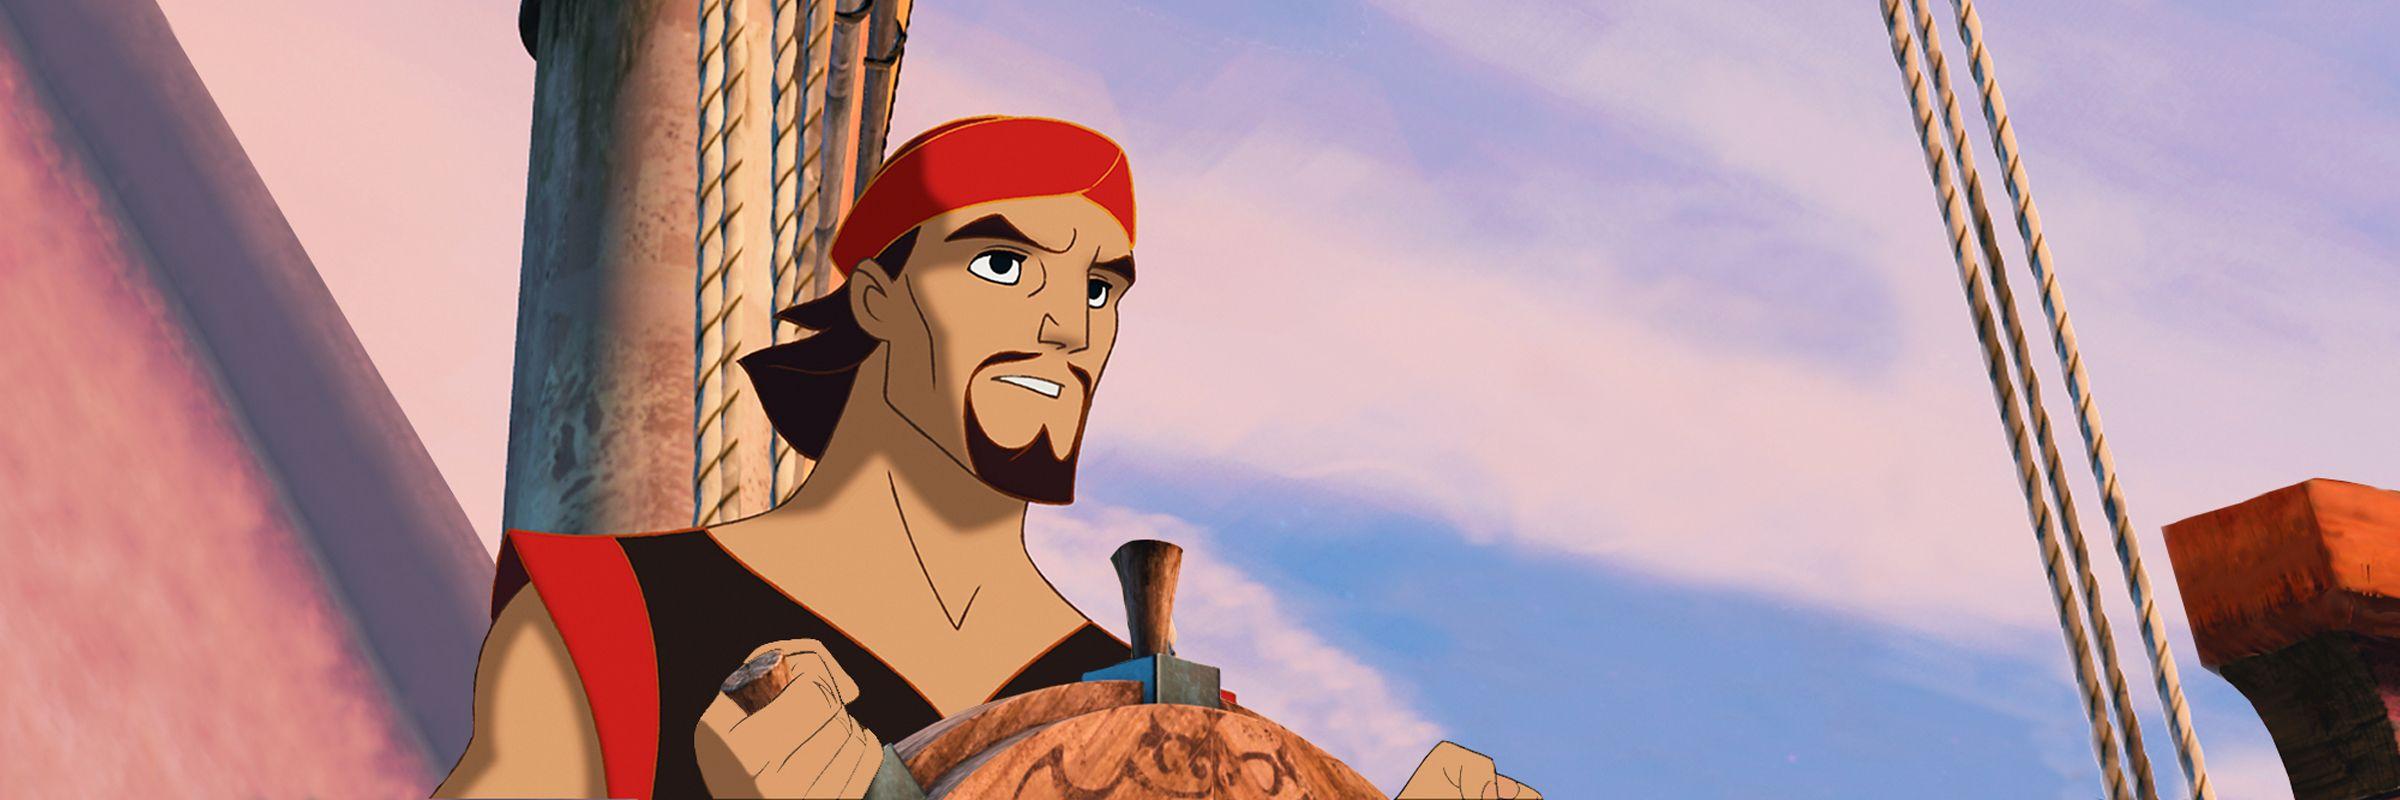 Sinbad: Legend of the Seven Seas | Full Movie | Movies Anywhere